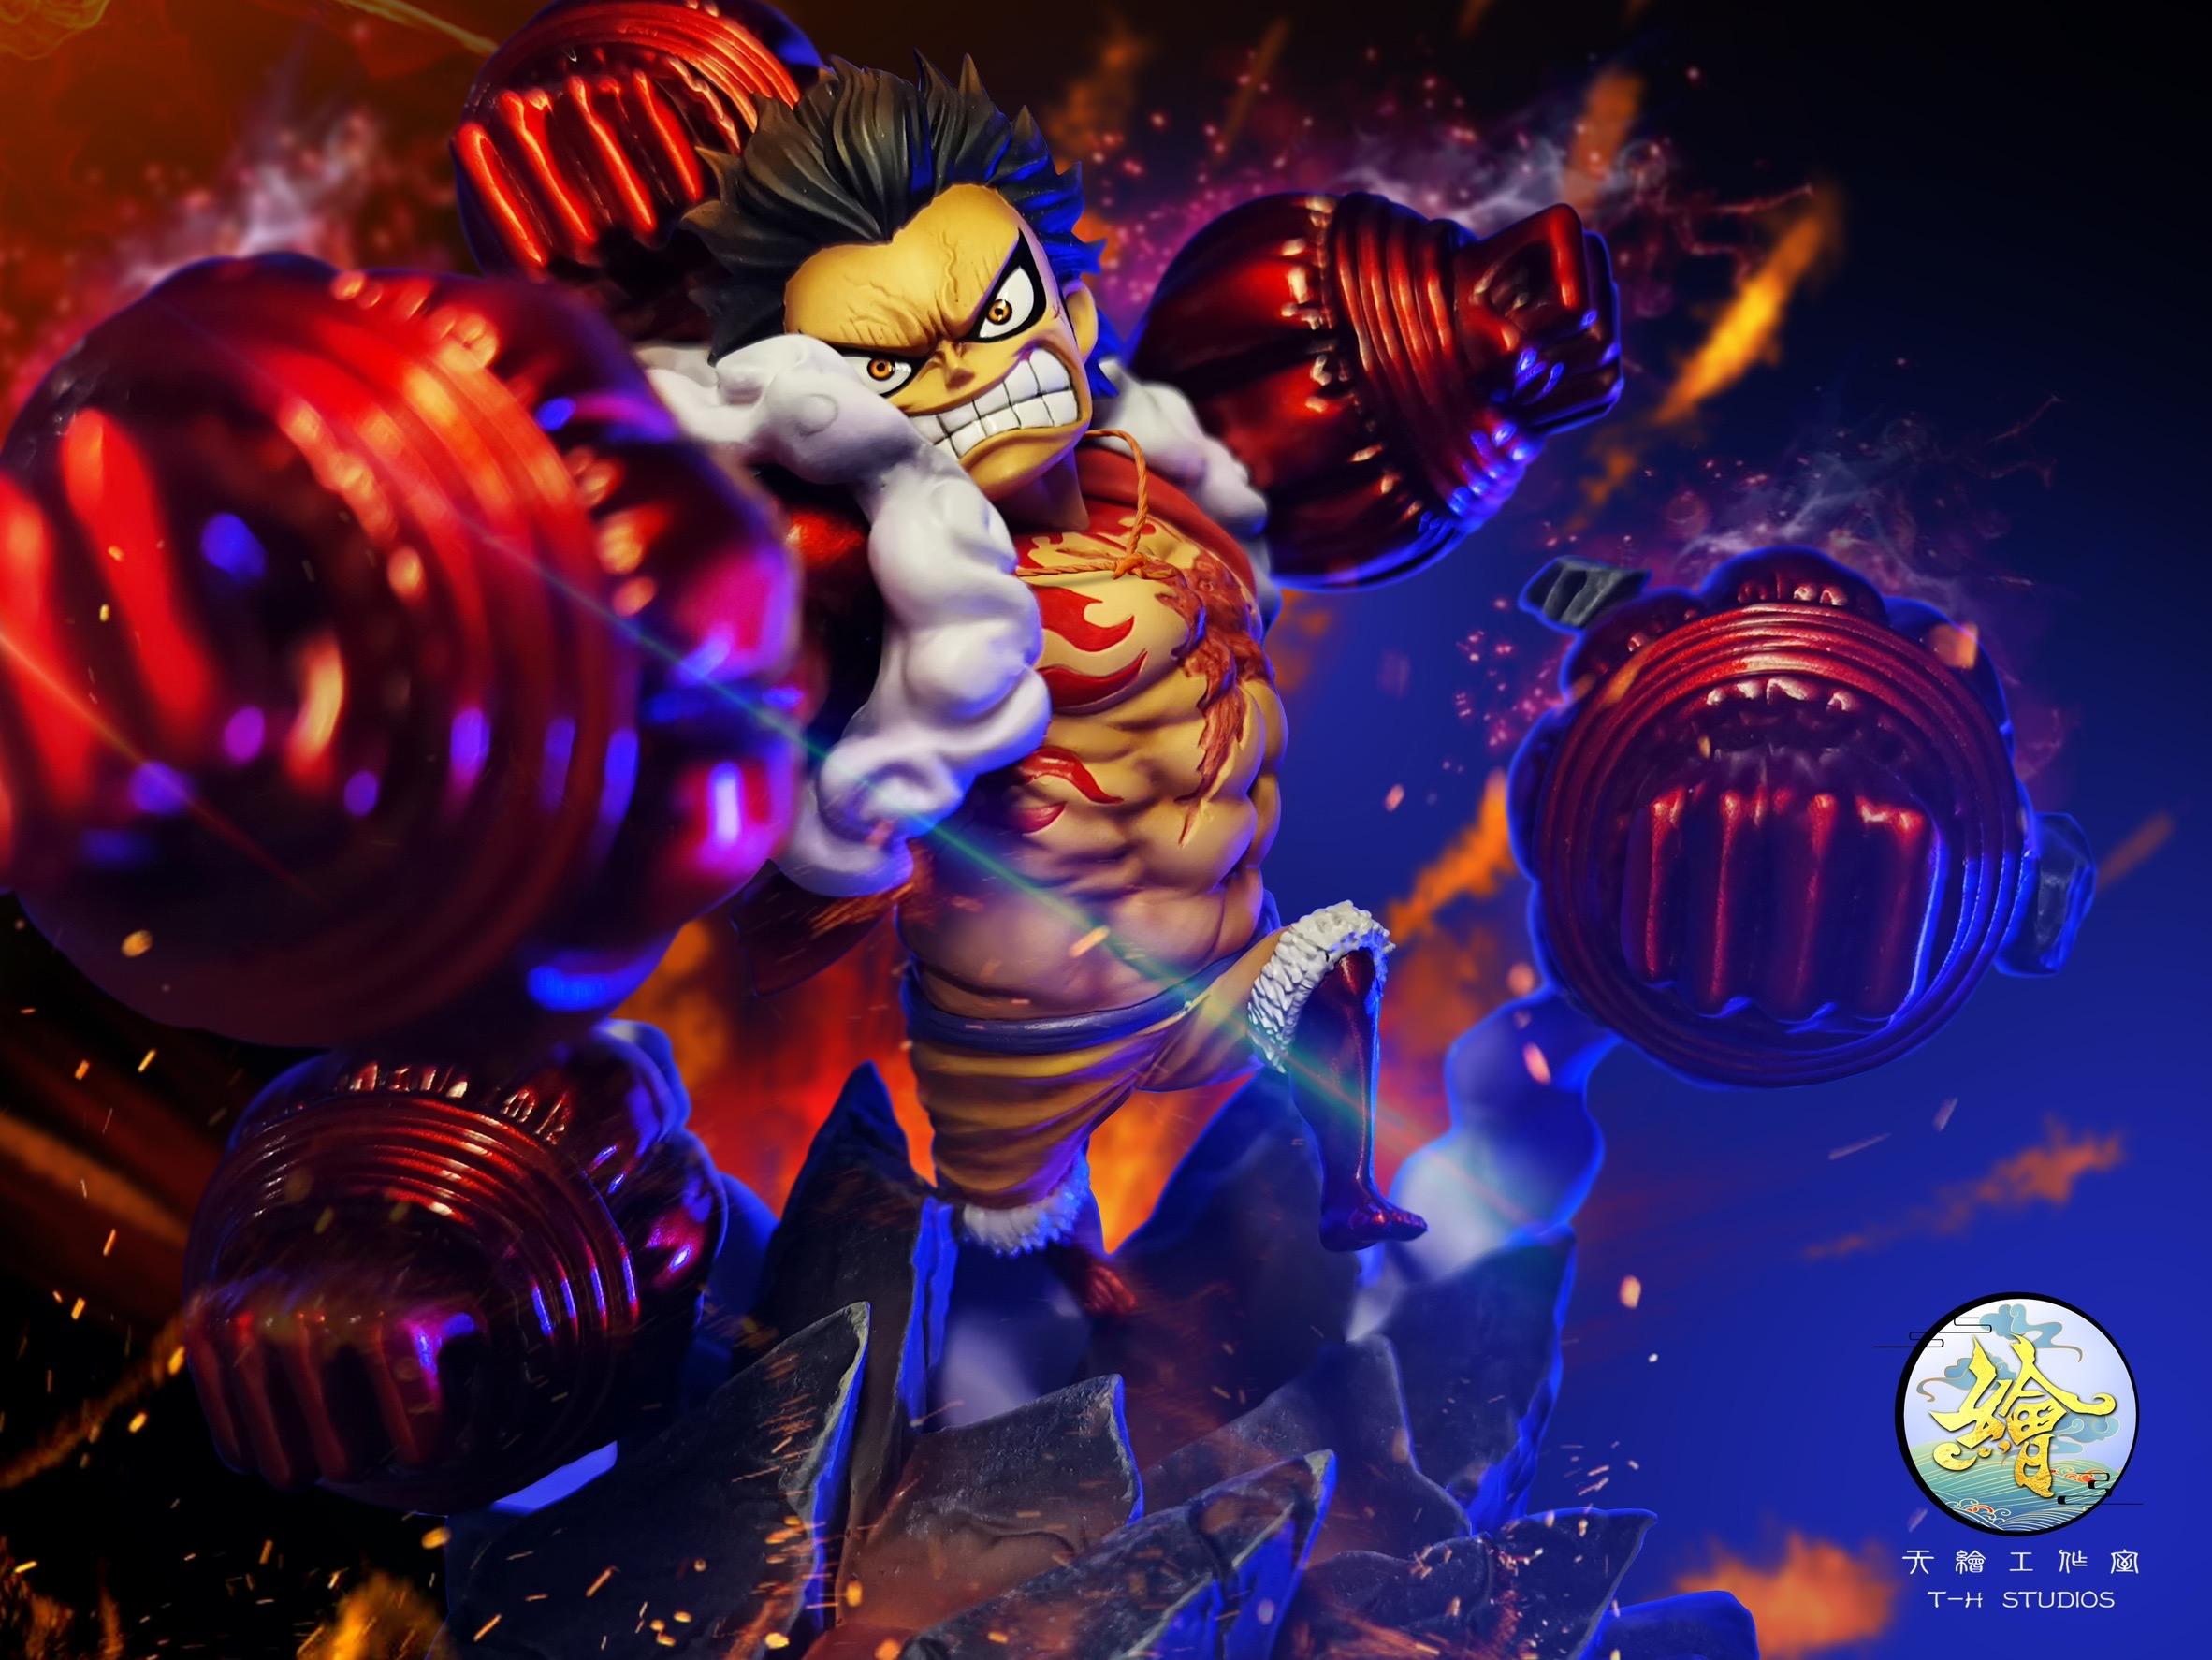 Monkey D. Luffy ลูฟี่ เกียร์4 by TianTong (มัดจำ)